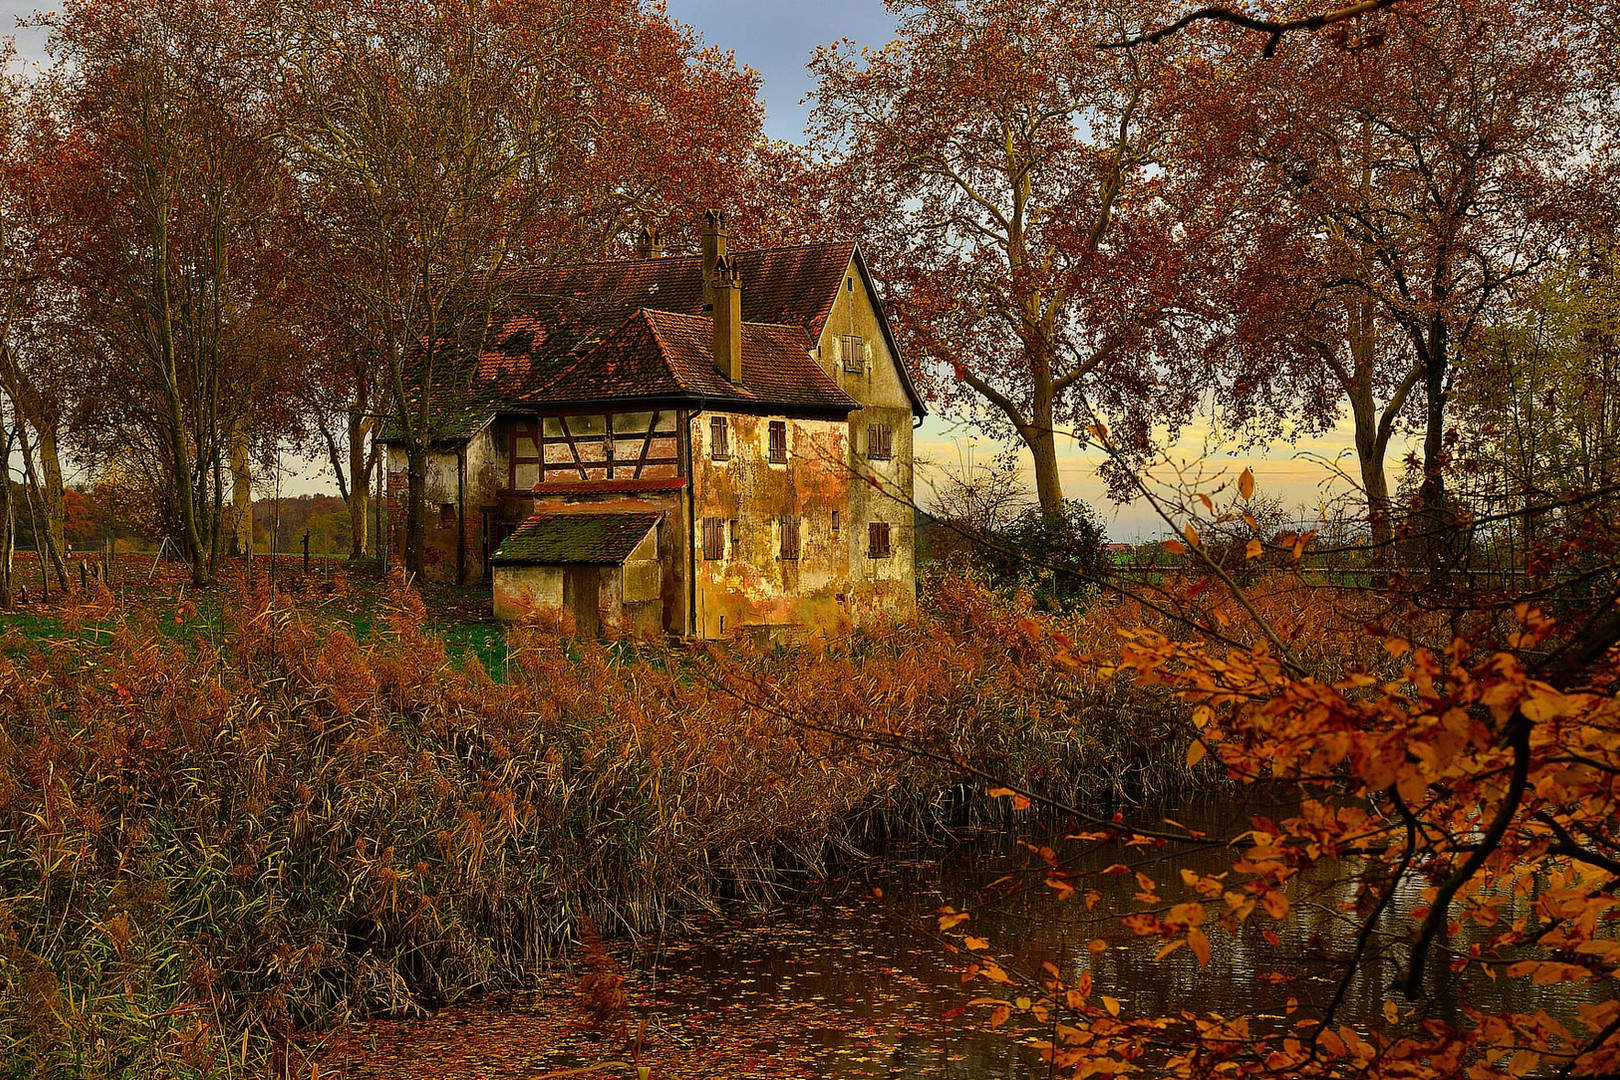 Verlassenes Haus im Herbst